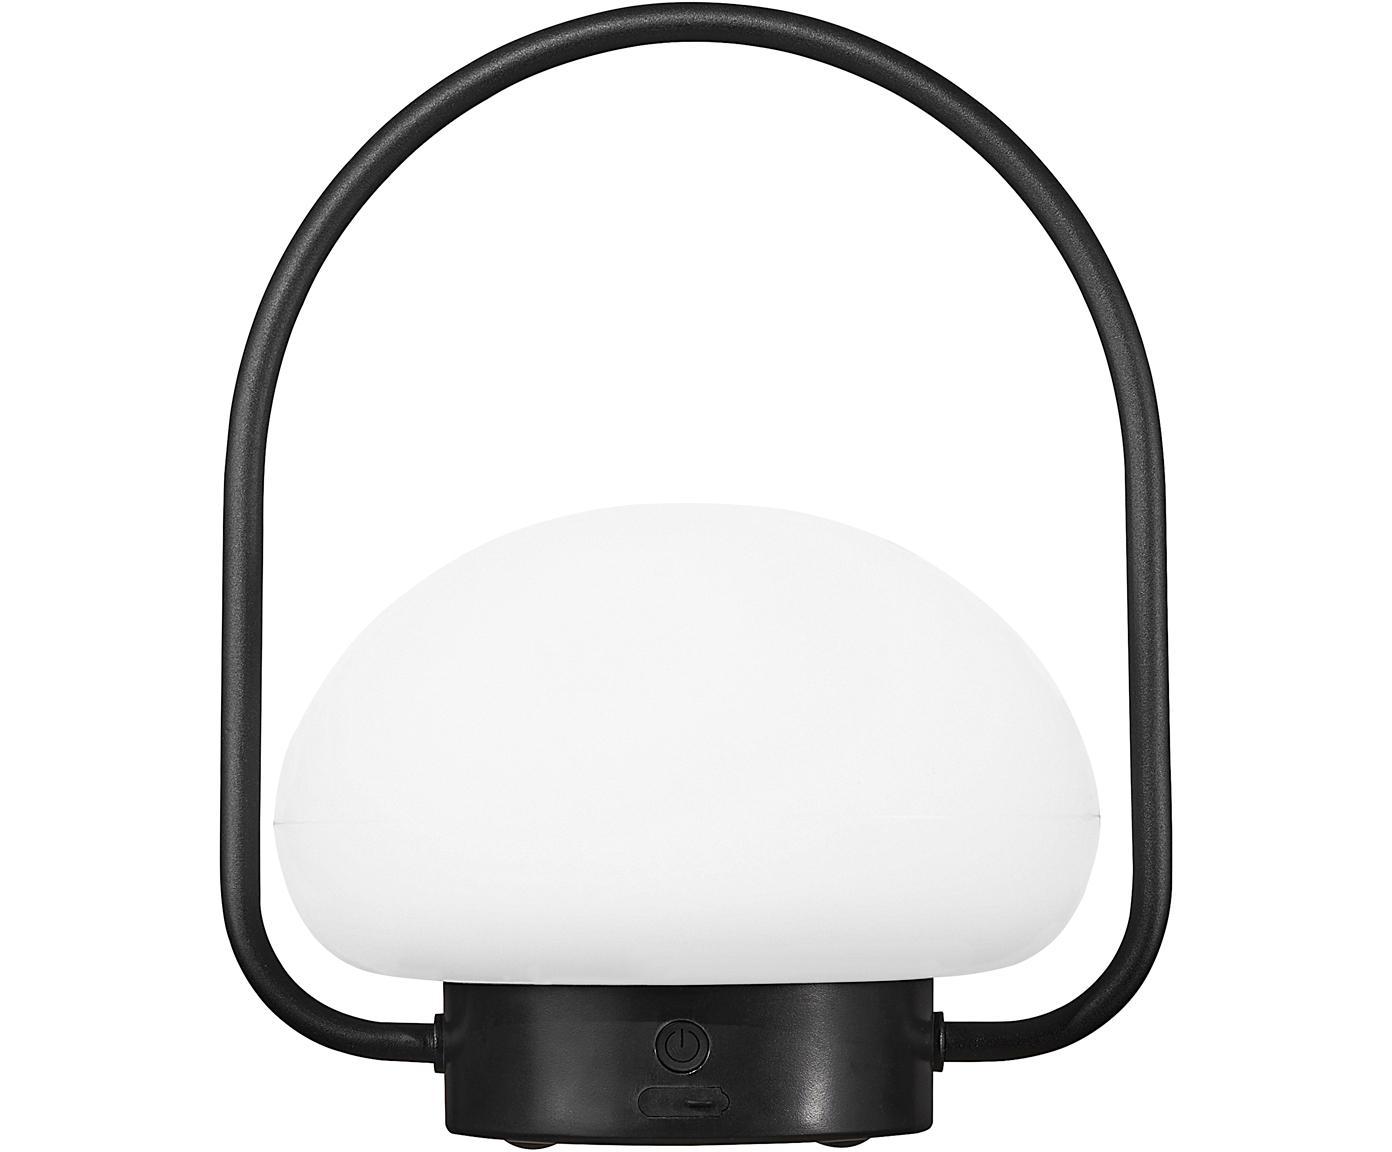 Lámpara de mesa LED regulable para exteriores Sponge, Plástico (PVC), Blanco, negro, Ø 23 x Al 28 cm